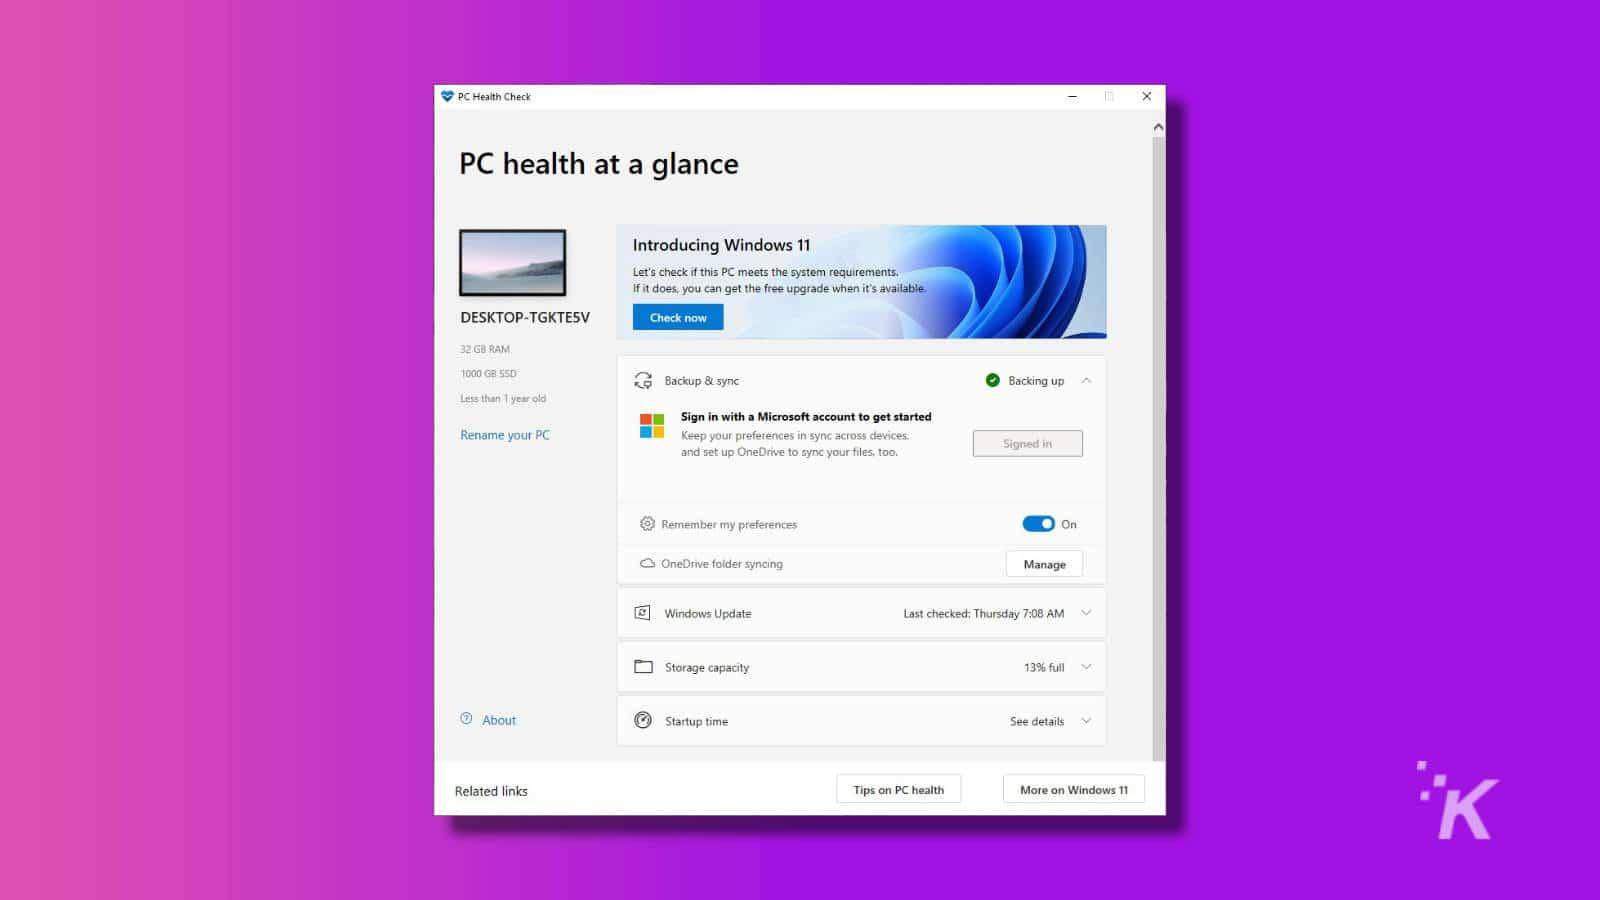 health check app windows